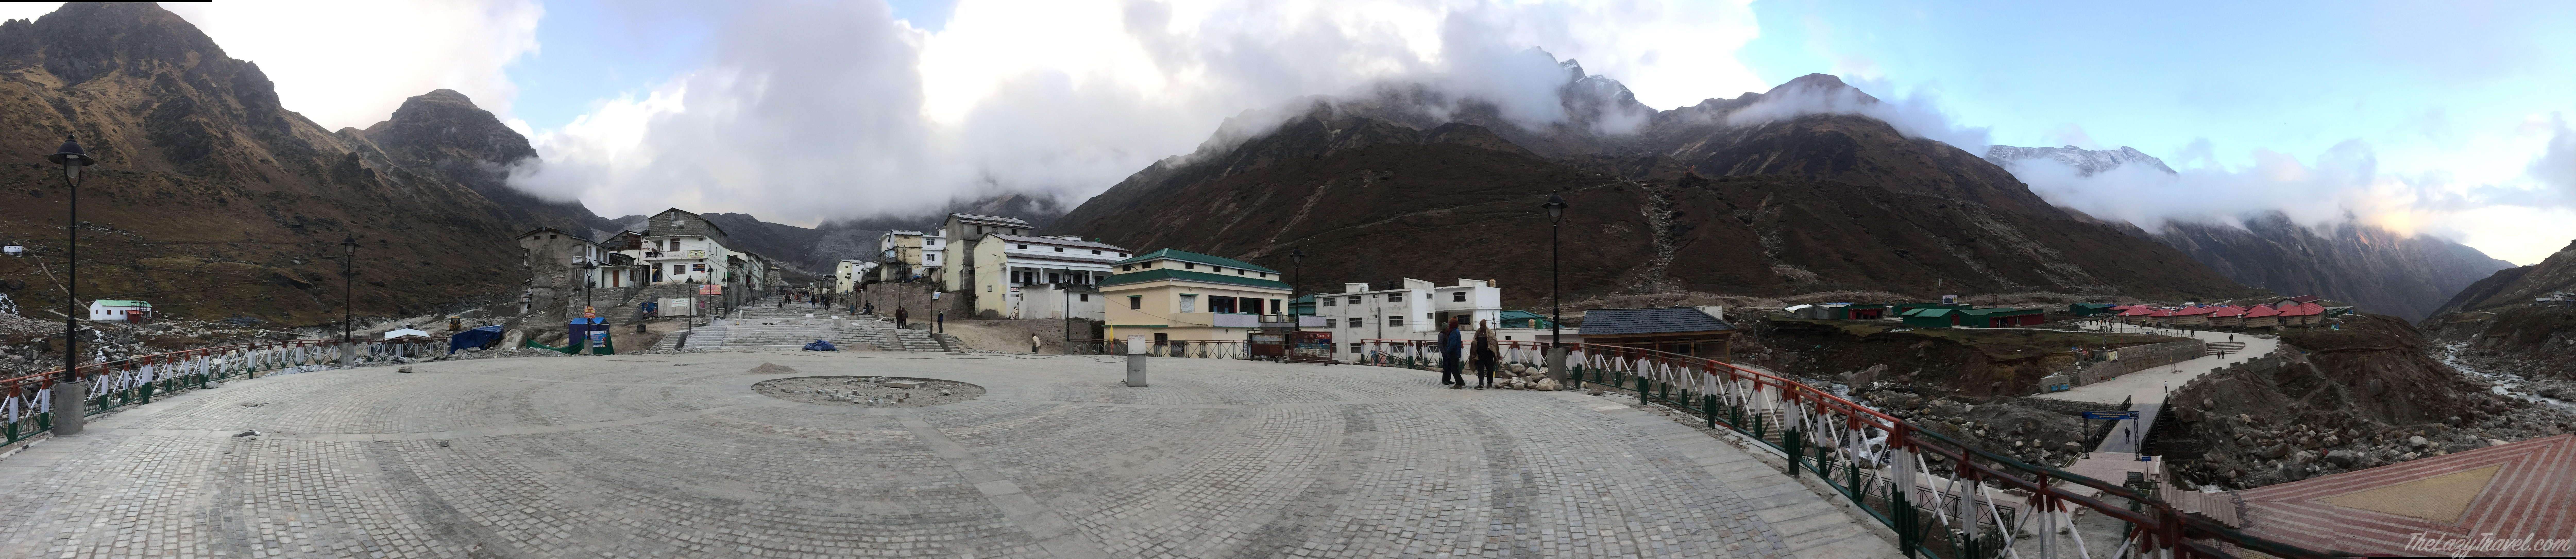 Kedarnath_Uttarakhand2